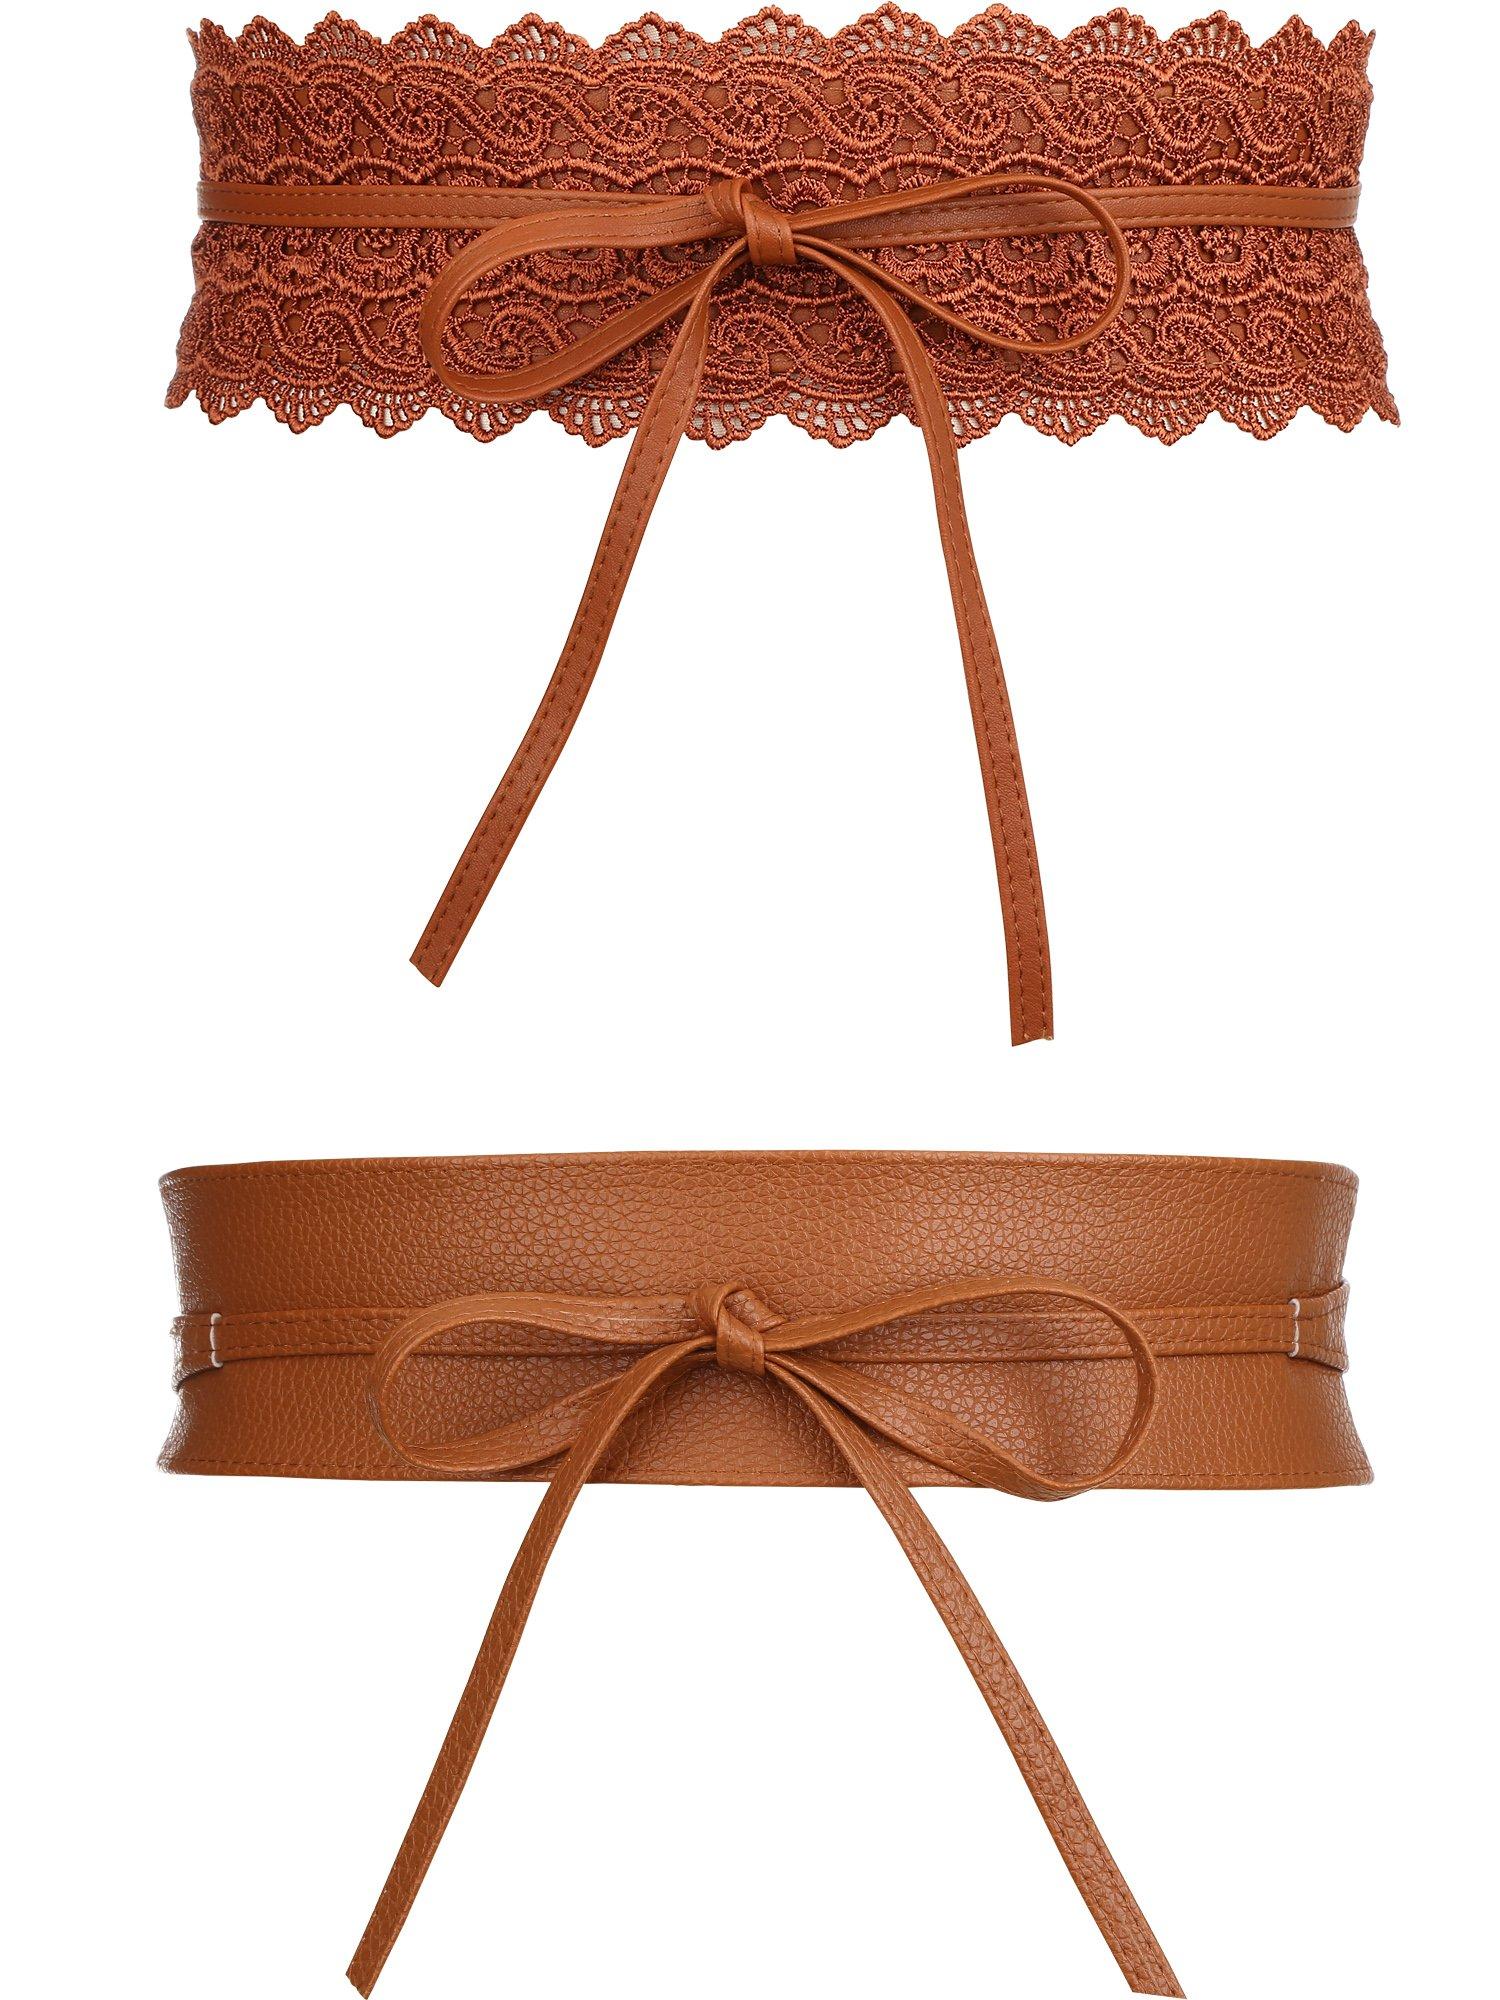 TecUnite 2 Styles Women's Leather Waist Belt Vintage Bowknot Leather Wide Waist Cinch Belt Wrap Around Bow Tie for Dresses (Tan)